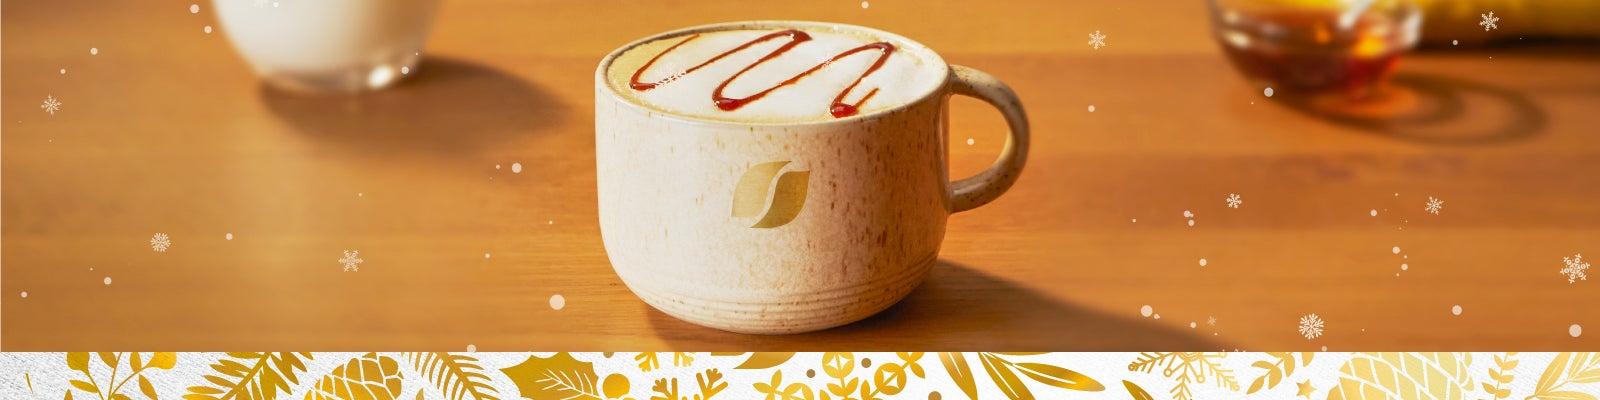 Festive-Creamy-Caramel-Latte